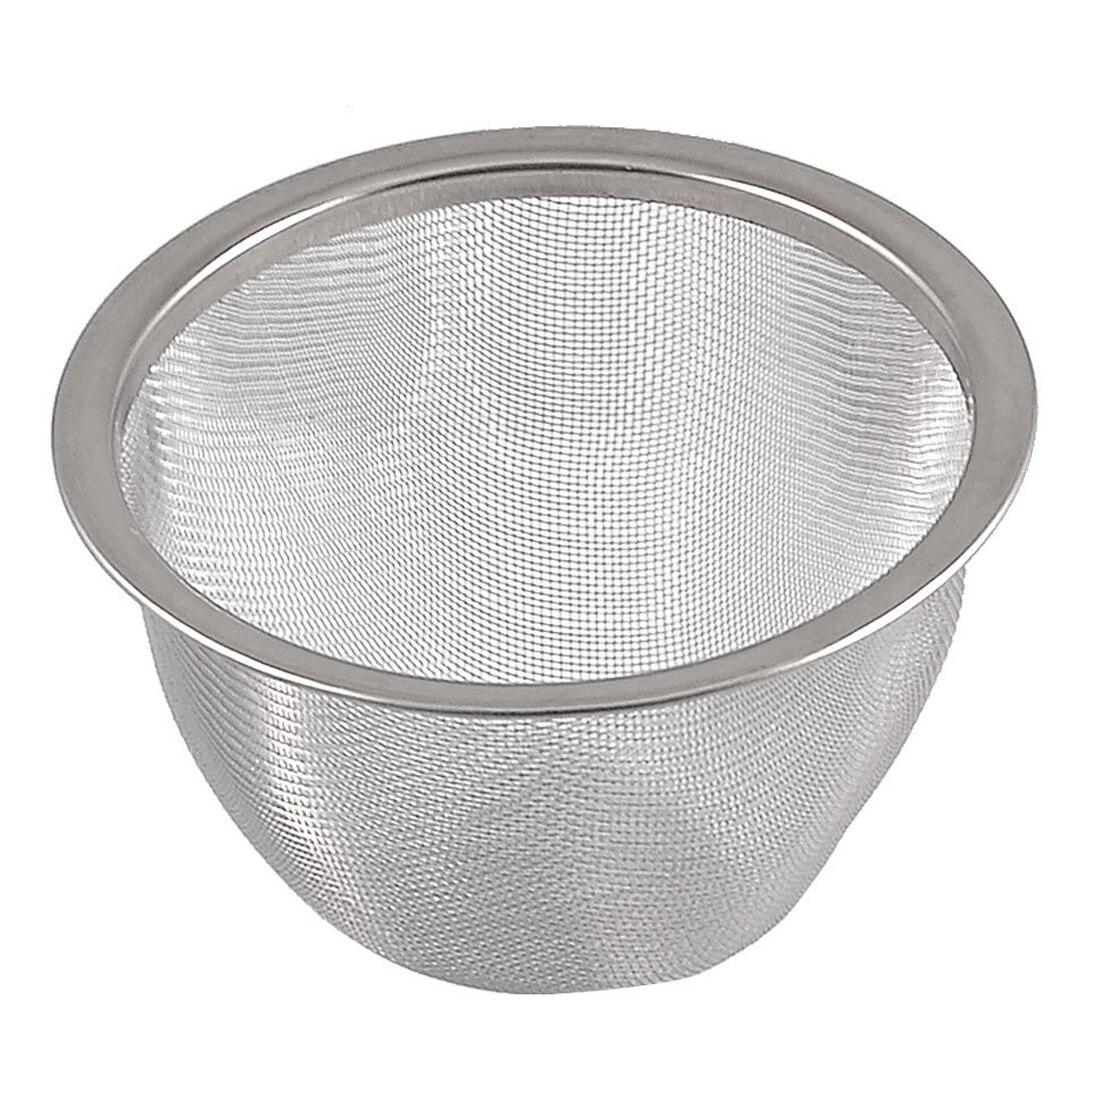 Teekanne durchmesser 80mm metall mesh tee Blatt gewürze sieb korb